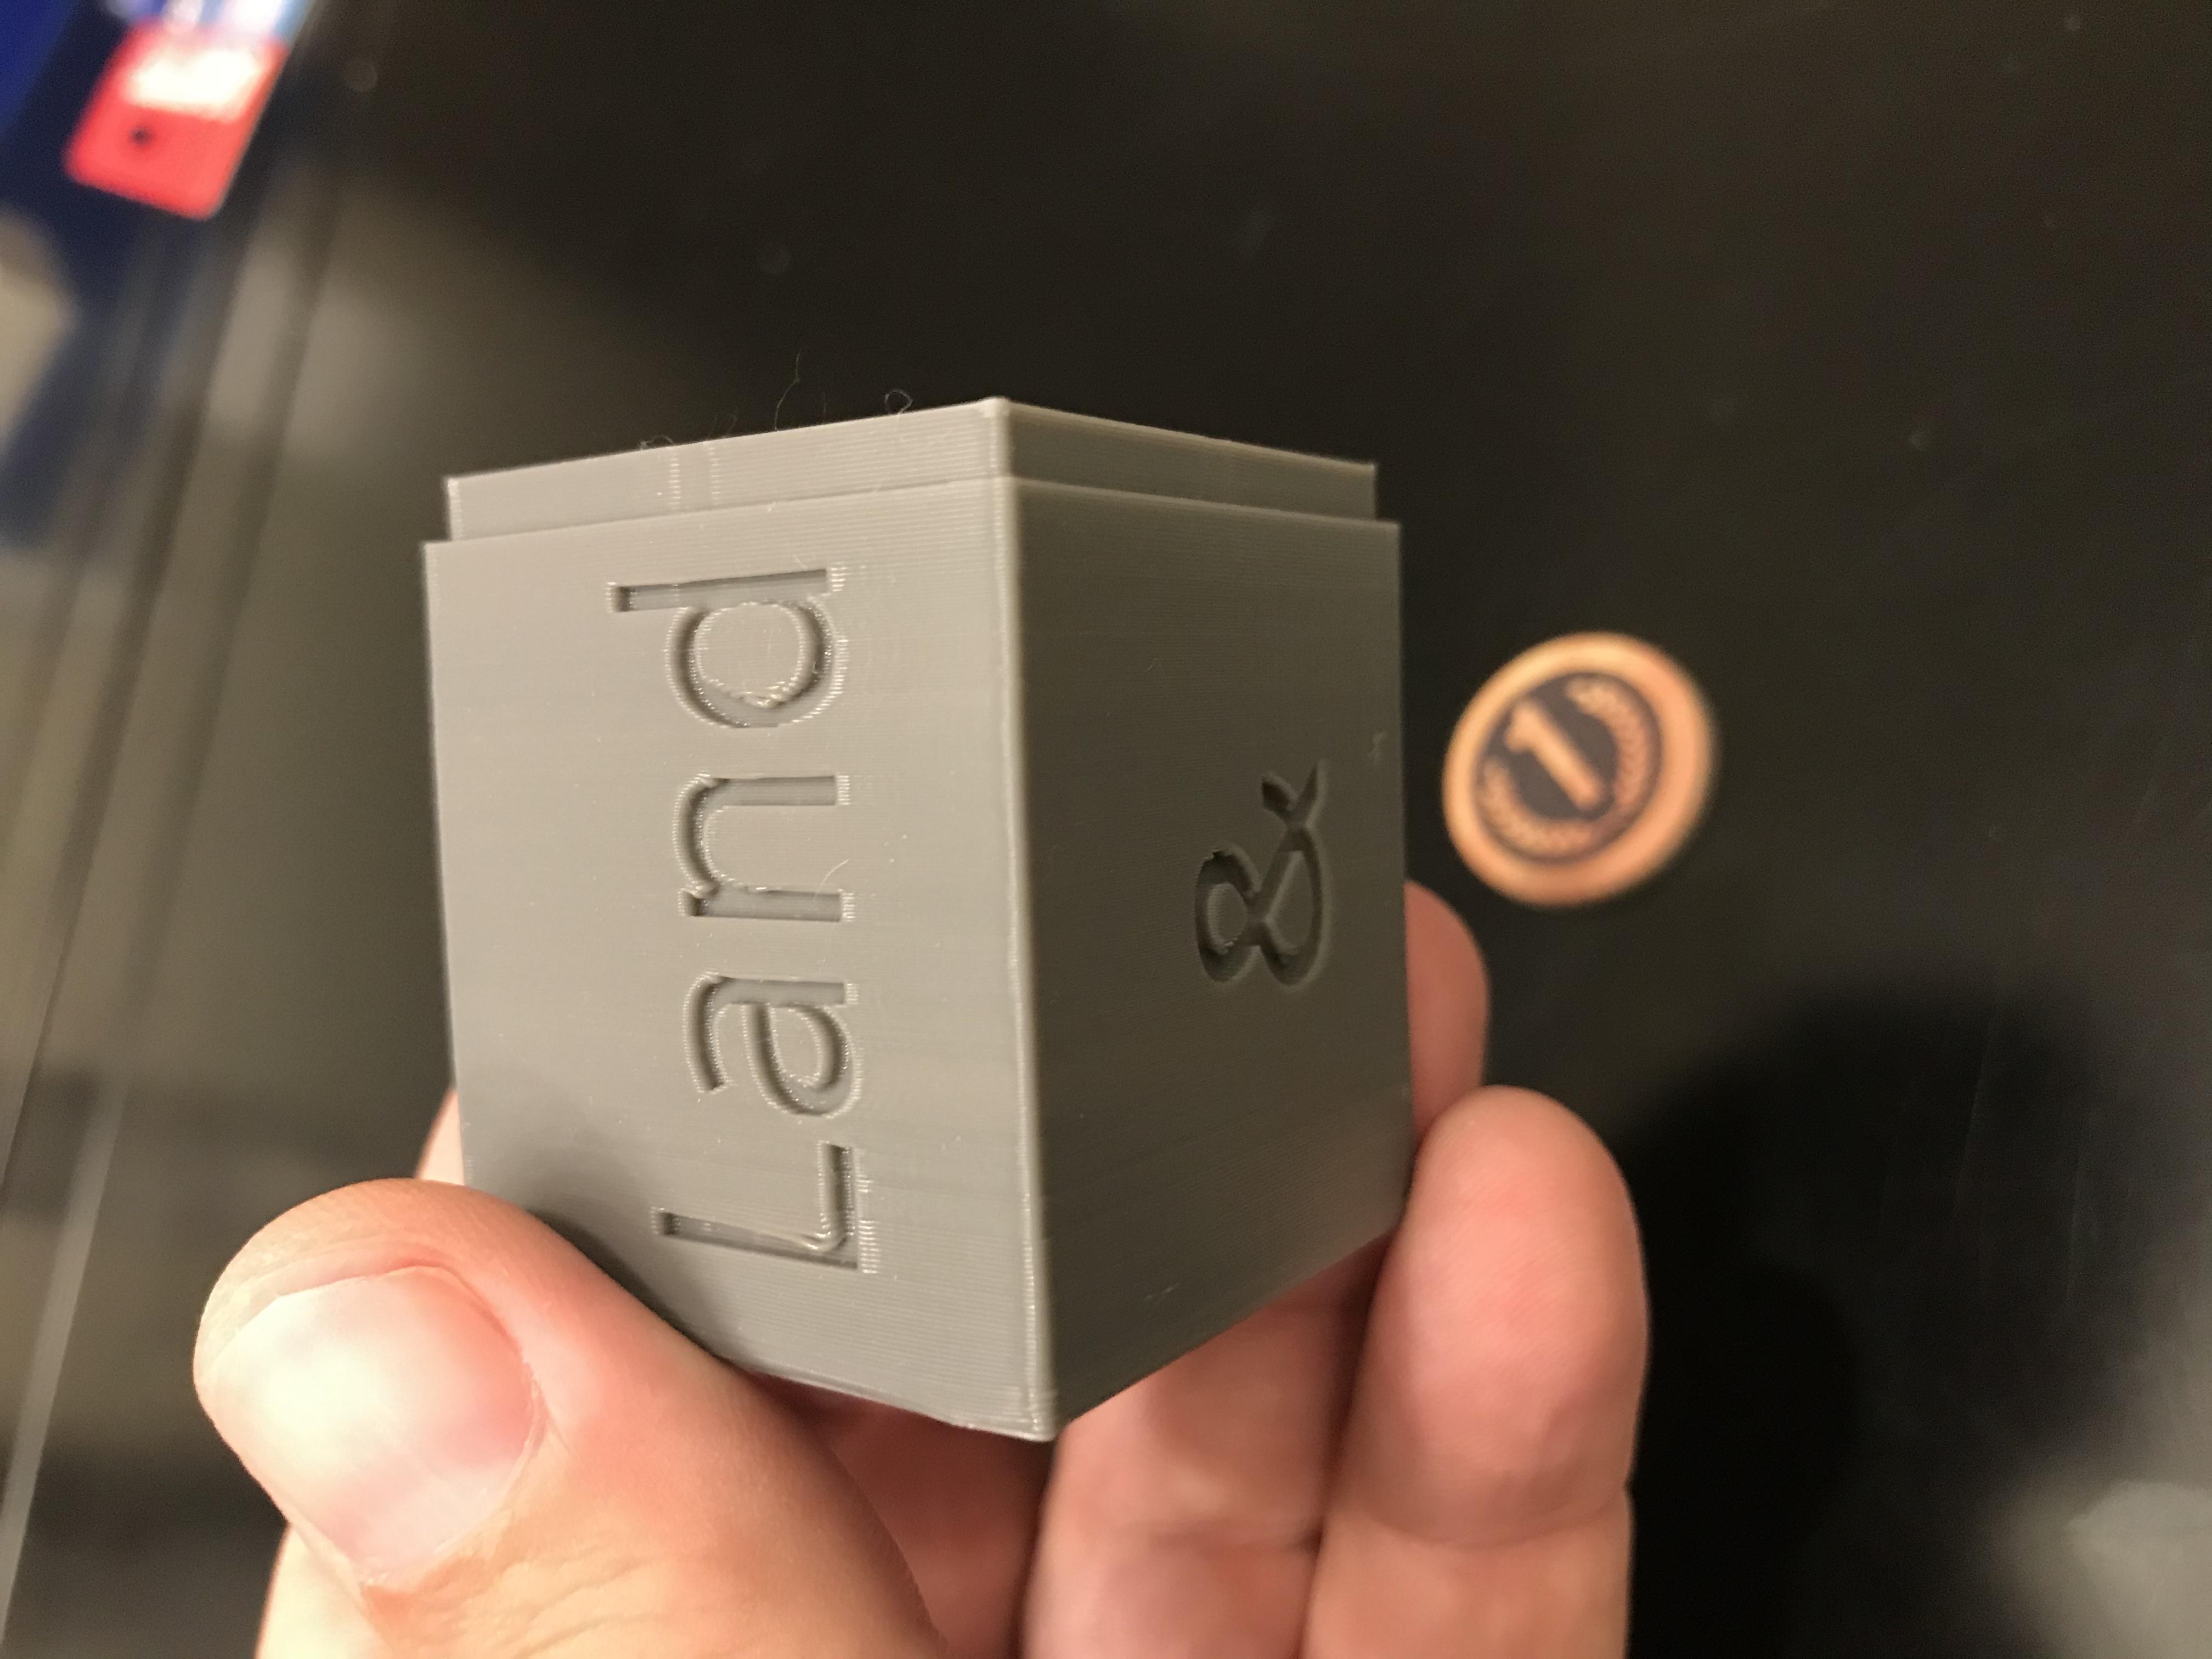 2019-09-28_20.33.22.jpg Download free STL file Air, Land, & Sea Victory Points Holder • 3D printer model, Hardcore3D